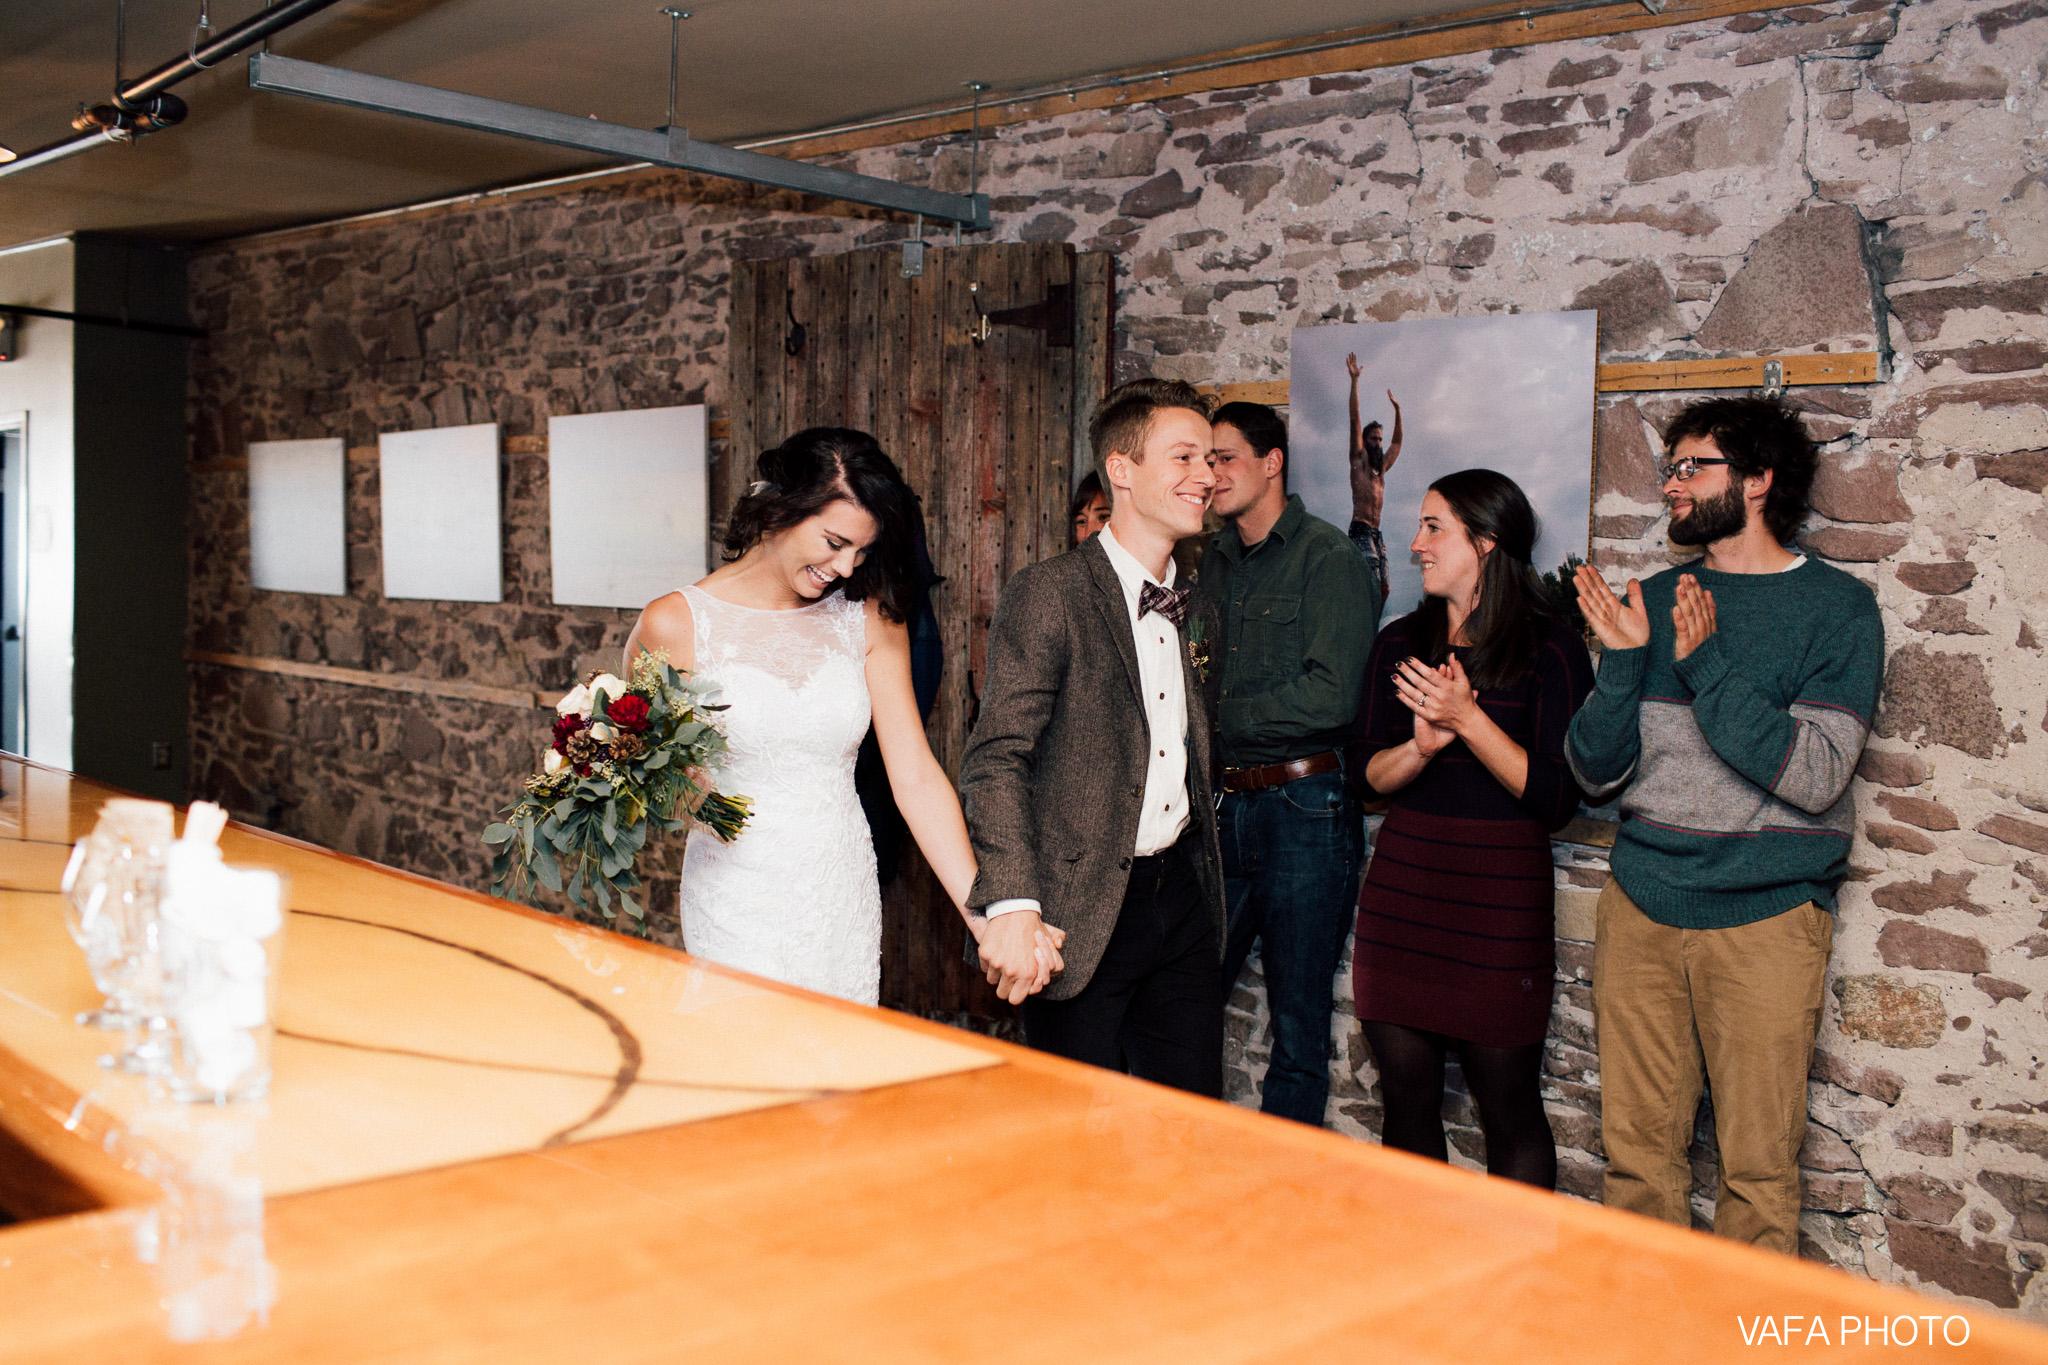 Hogback-Mountain-Wedding-Chelsea-Josh-Vafa-Photo-722.jpg